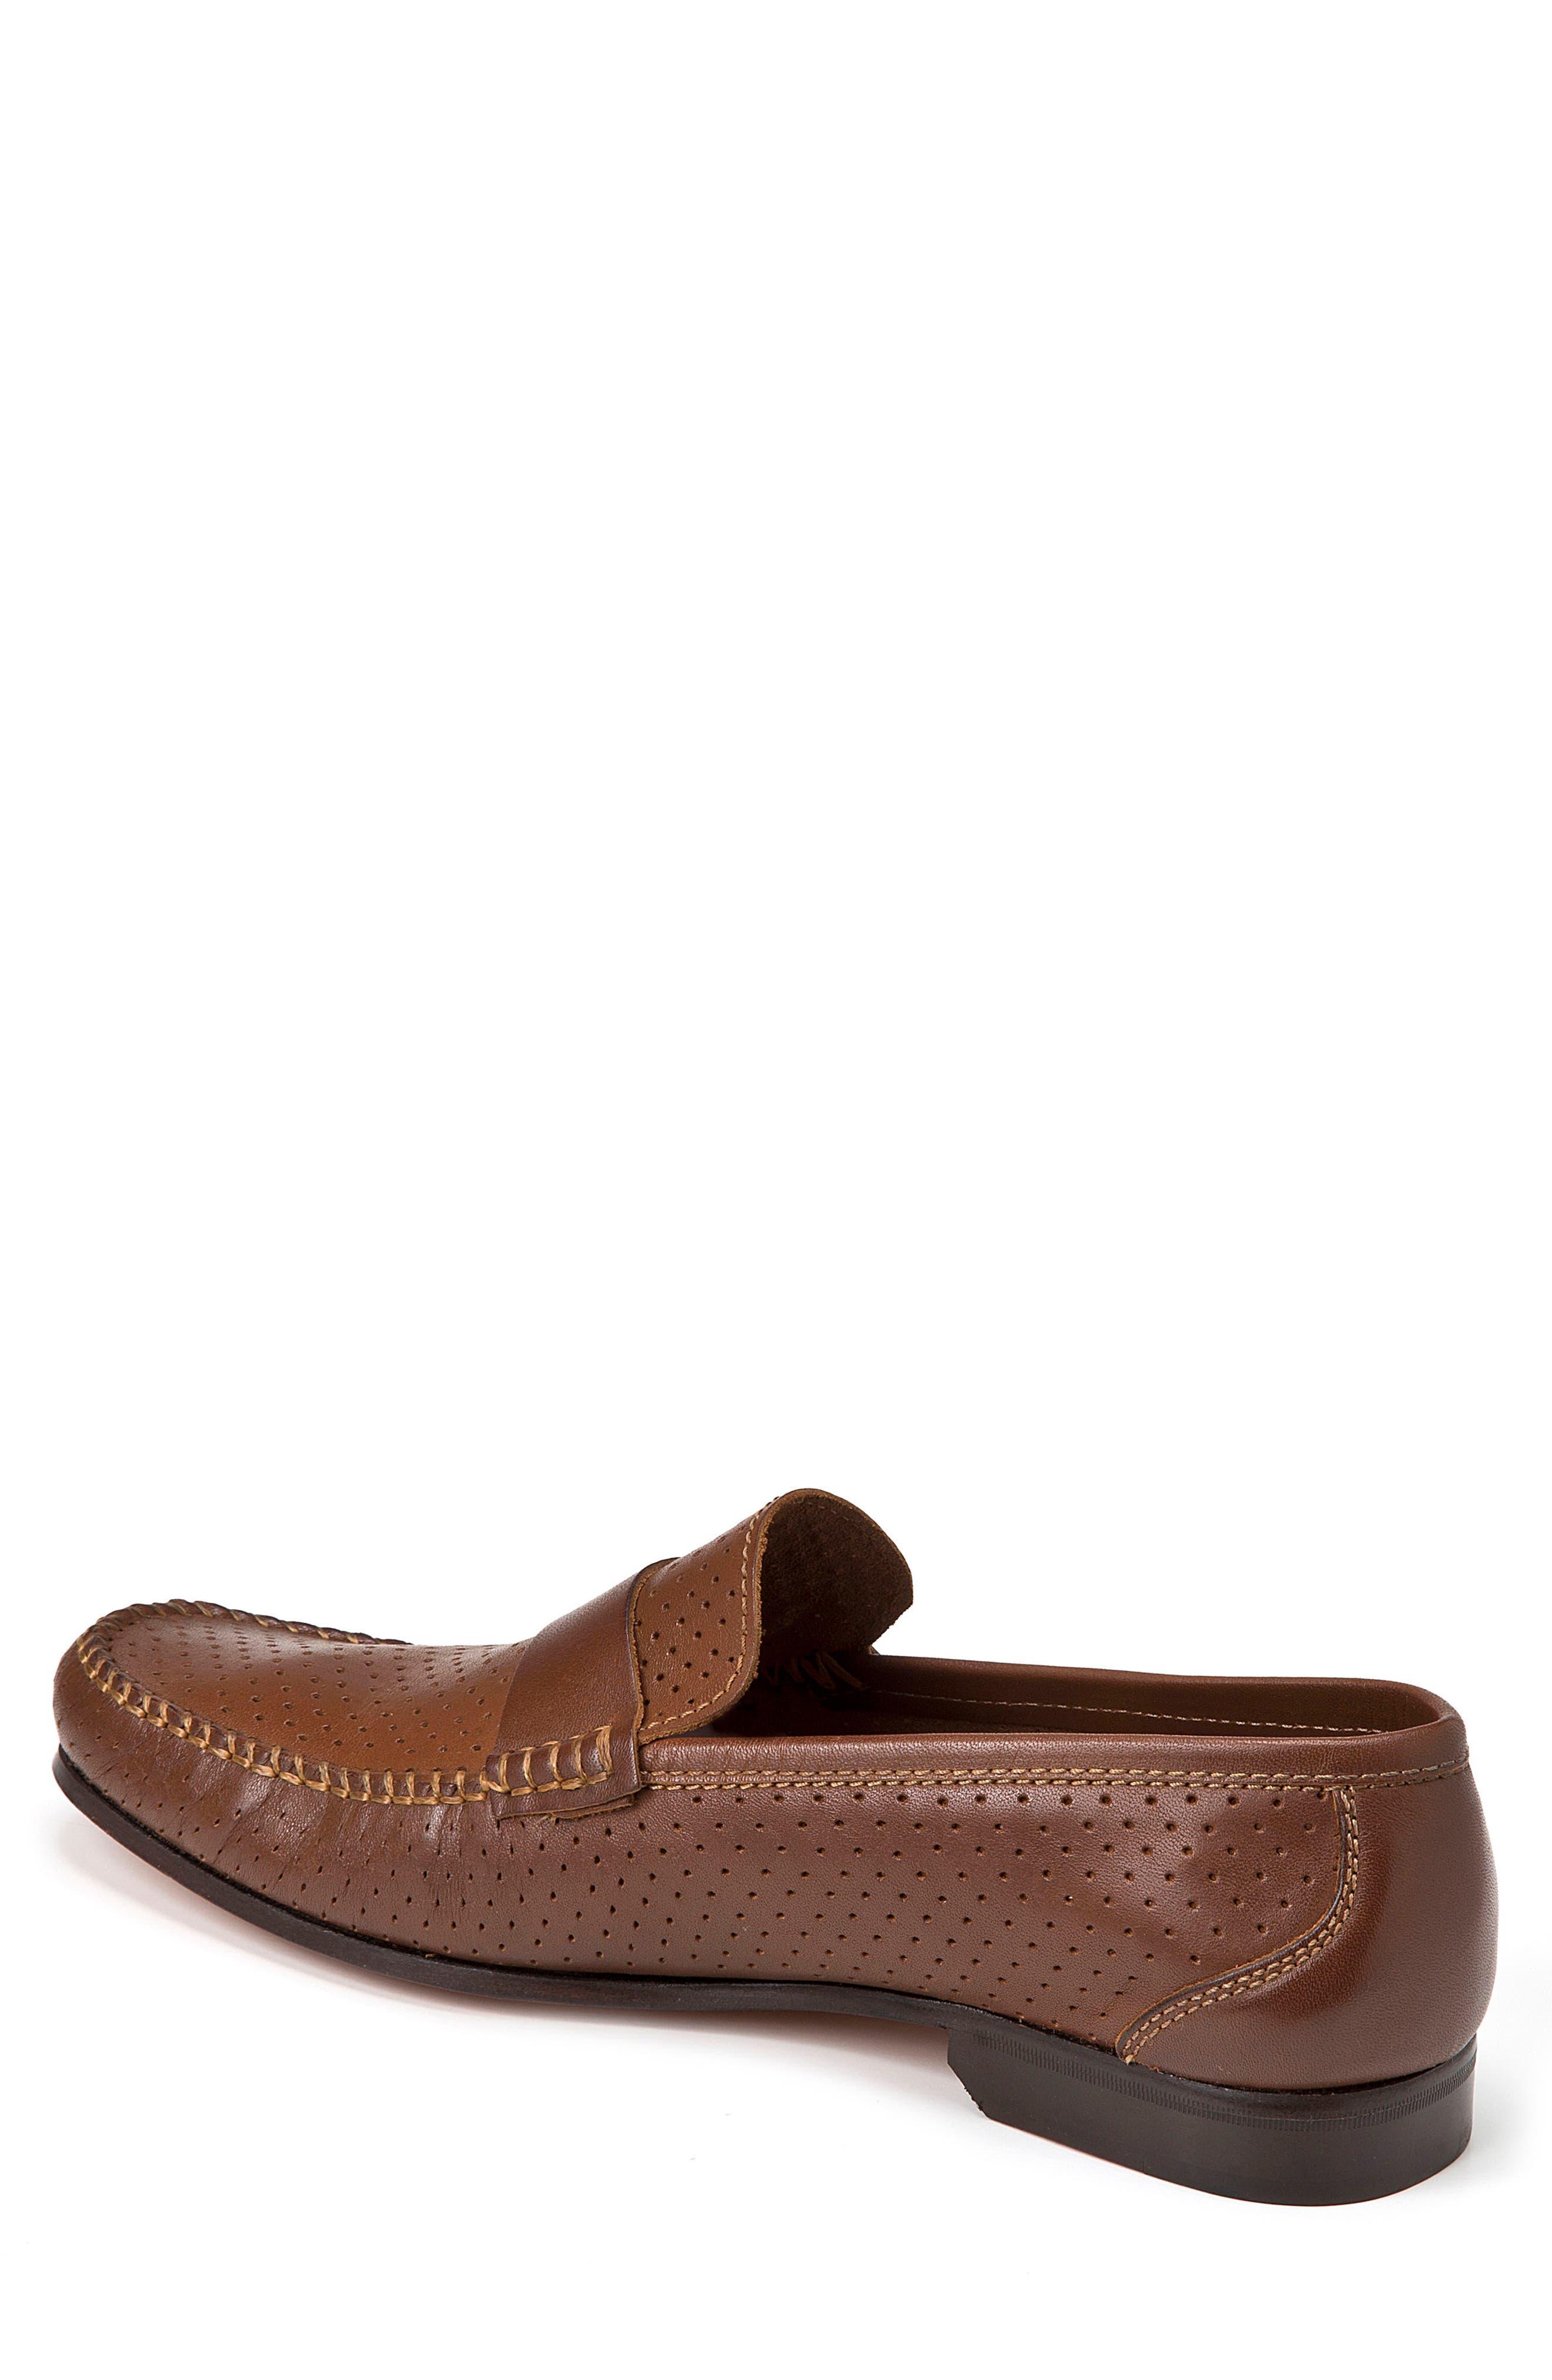 Alternate Image 2  - Sandro Moscoloni Alcazar Perforated Loafer (Men)